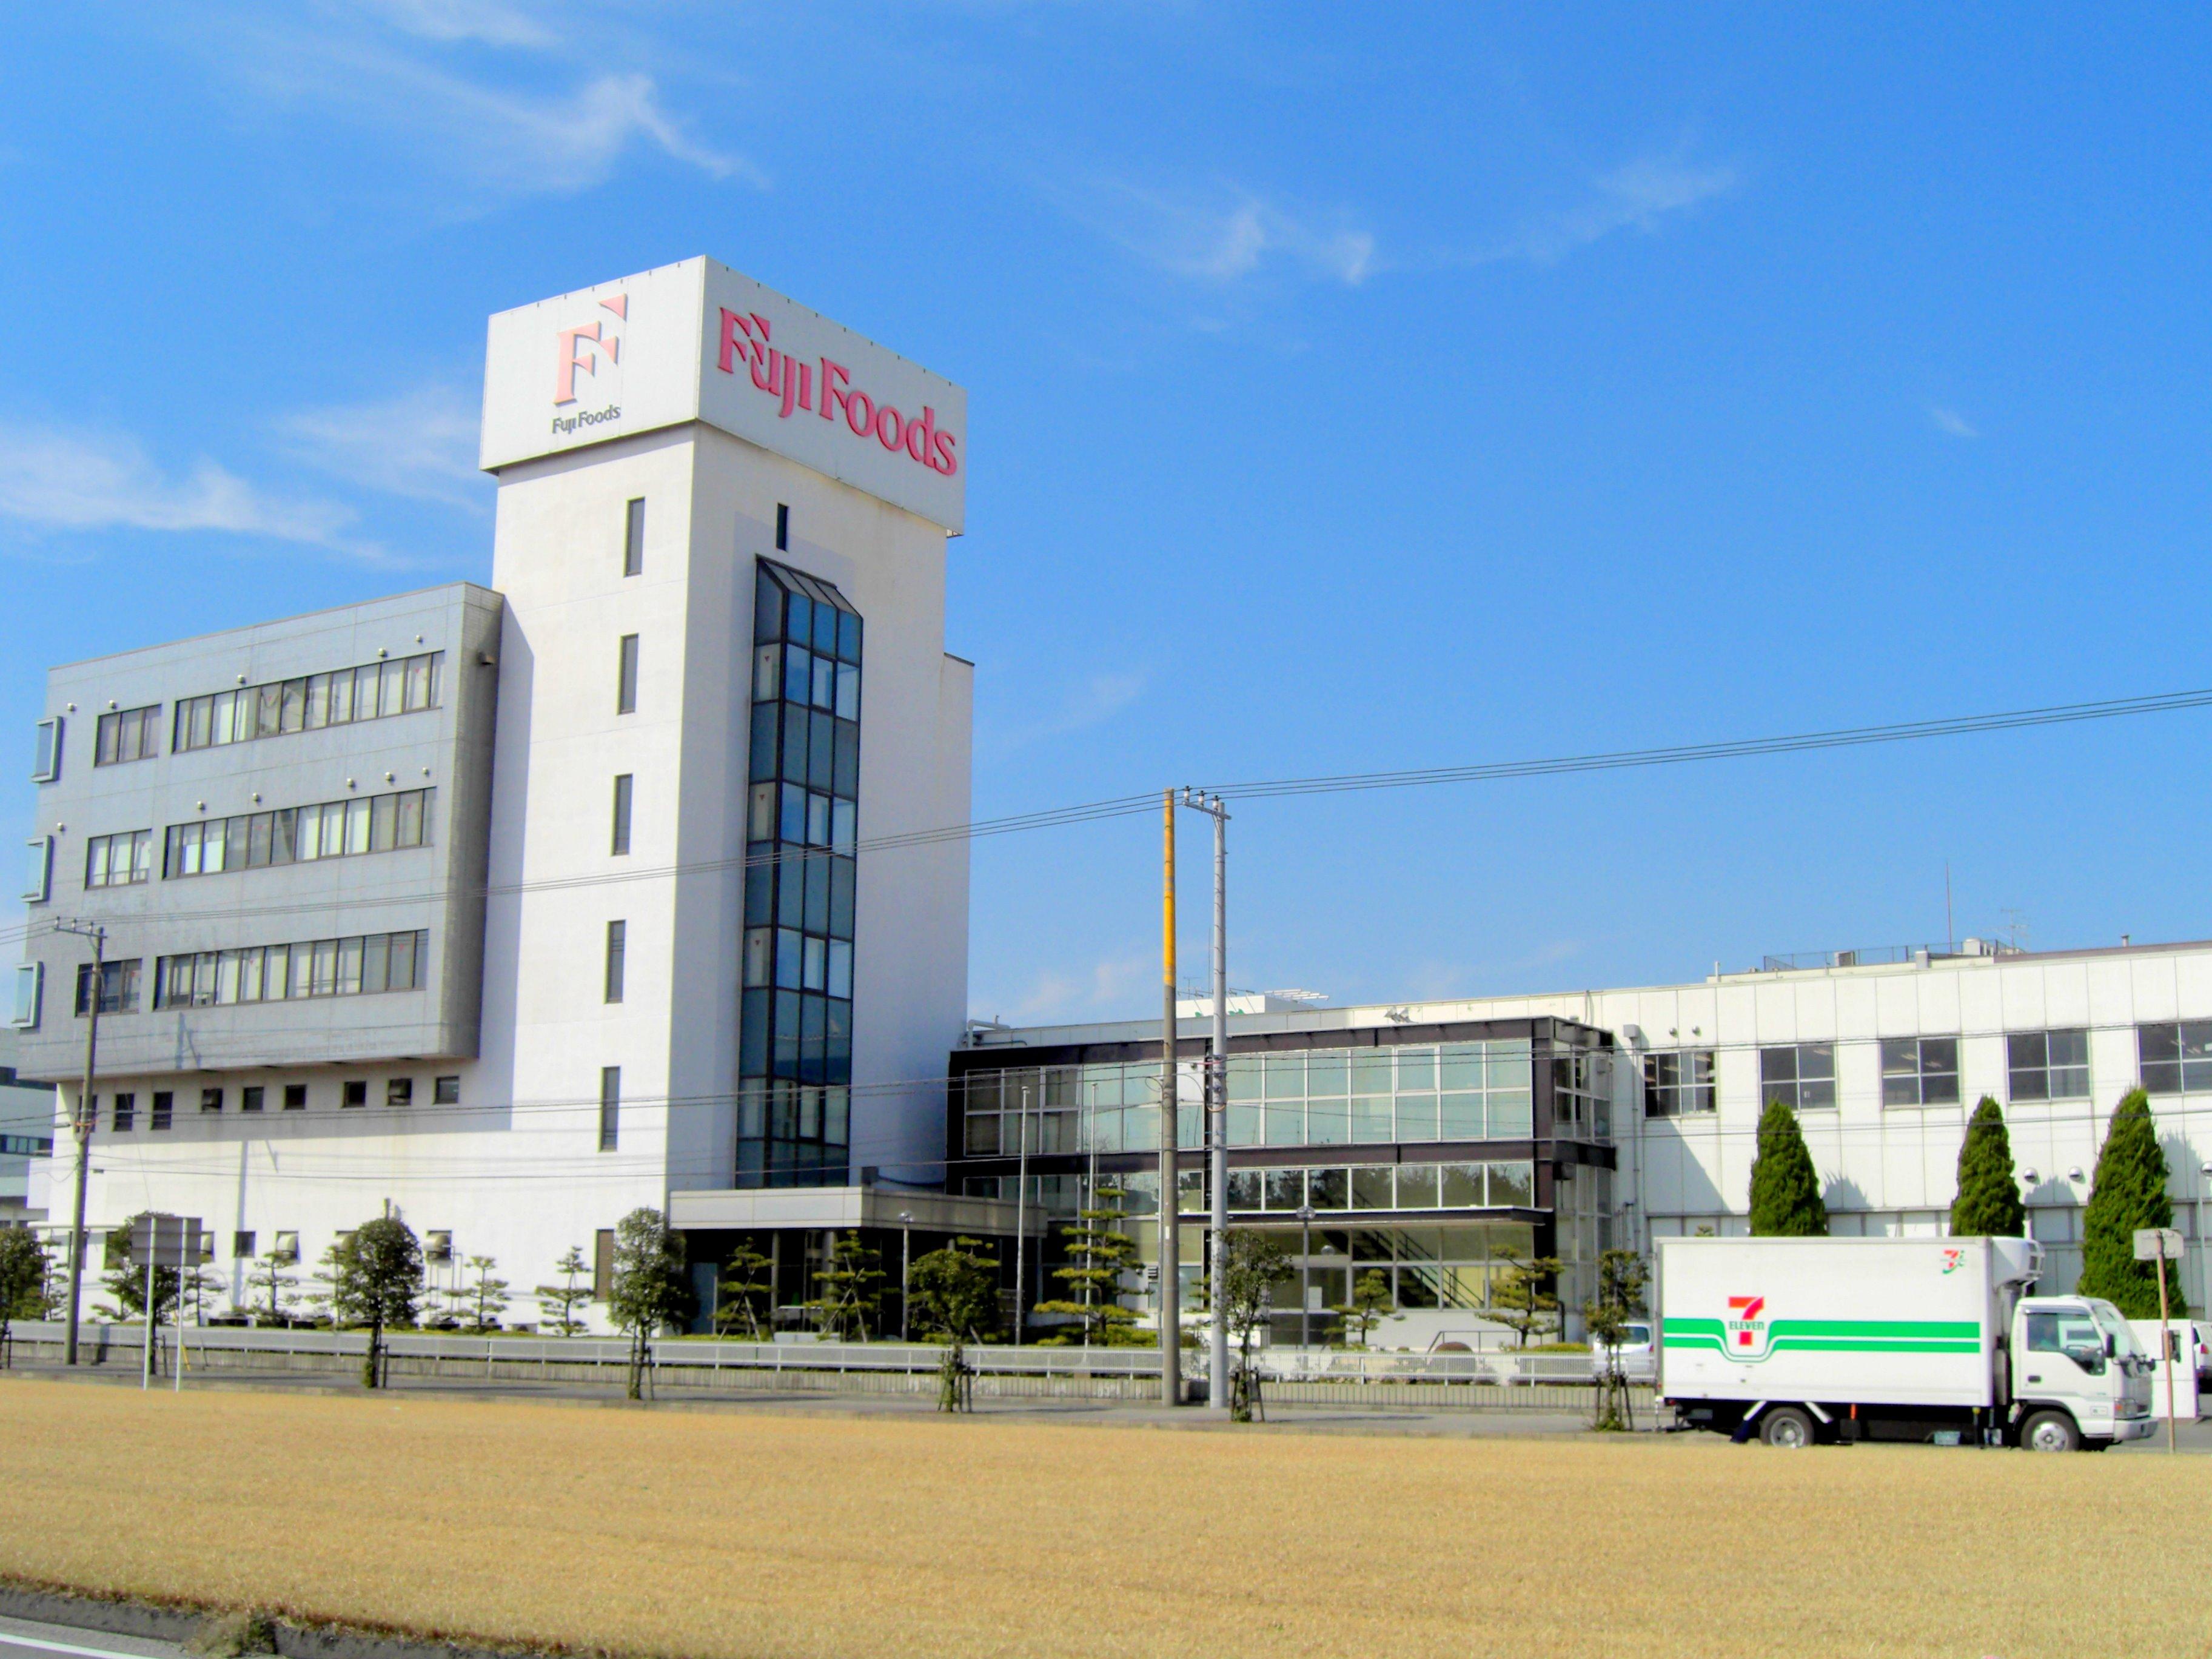 Fuji foods food file fuji foods head office with 7 11 delivery car jpg wikimedia malvernweather Gallery